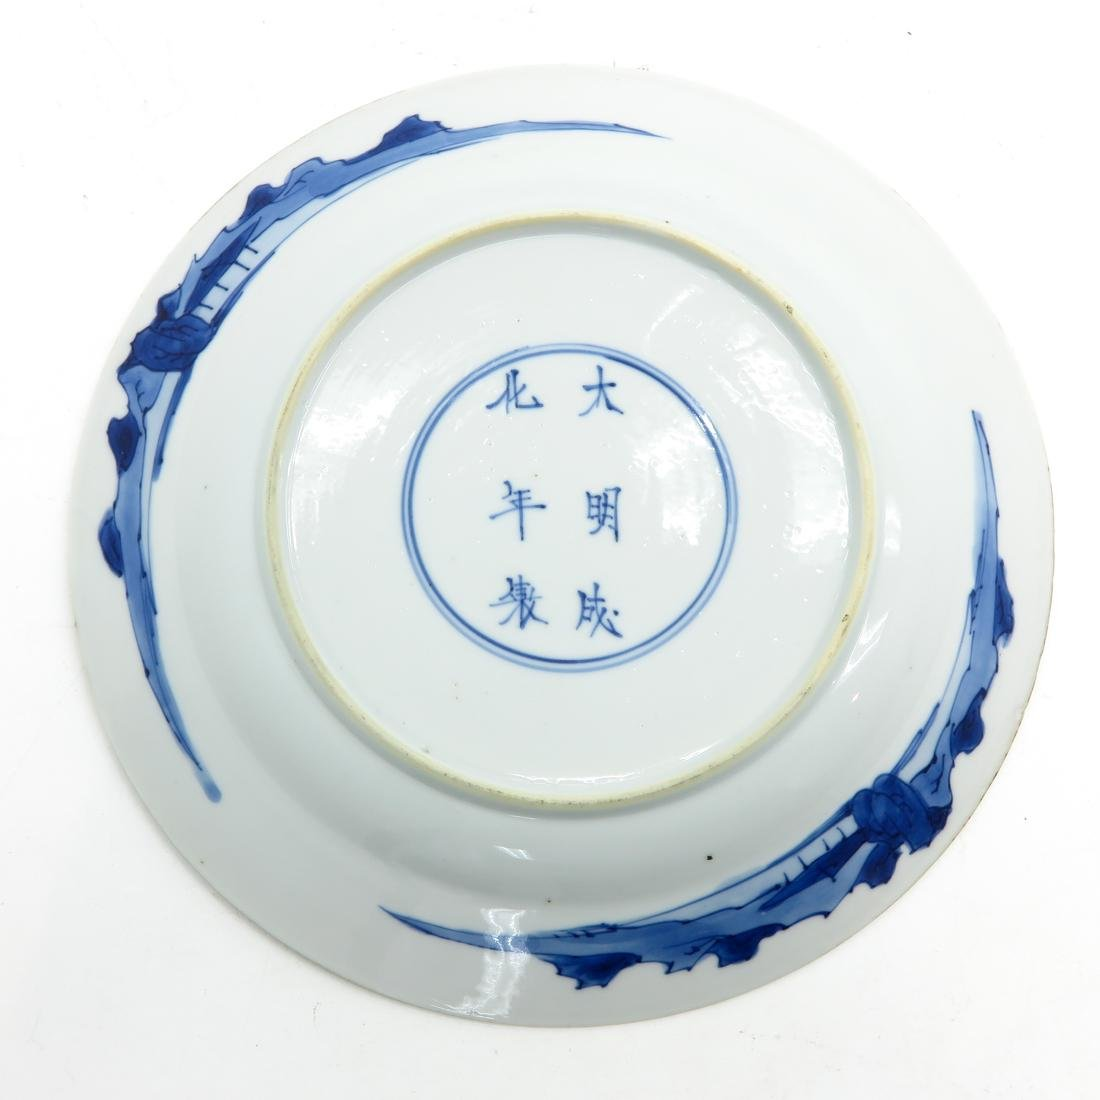 Plate - 2